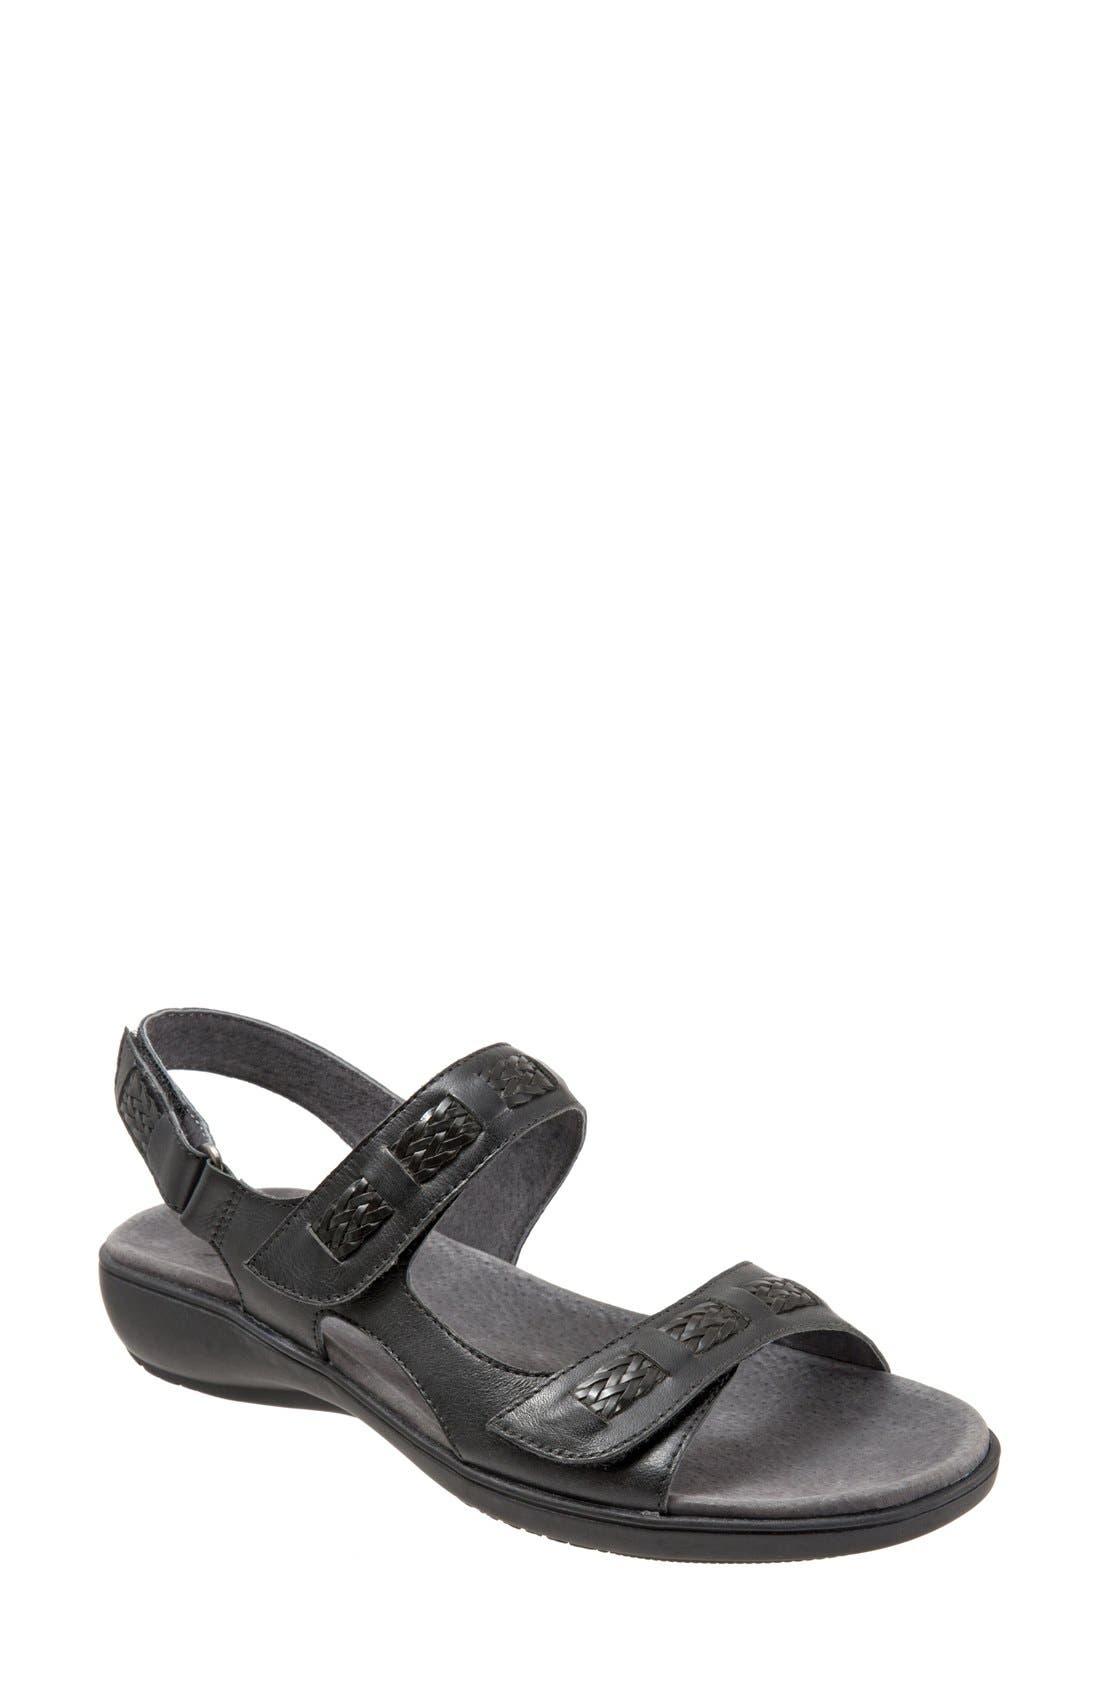 'Kip' Sandal,                         Main,                         color, Black Leather